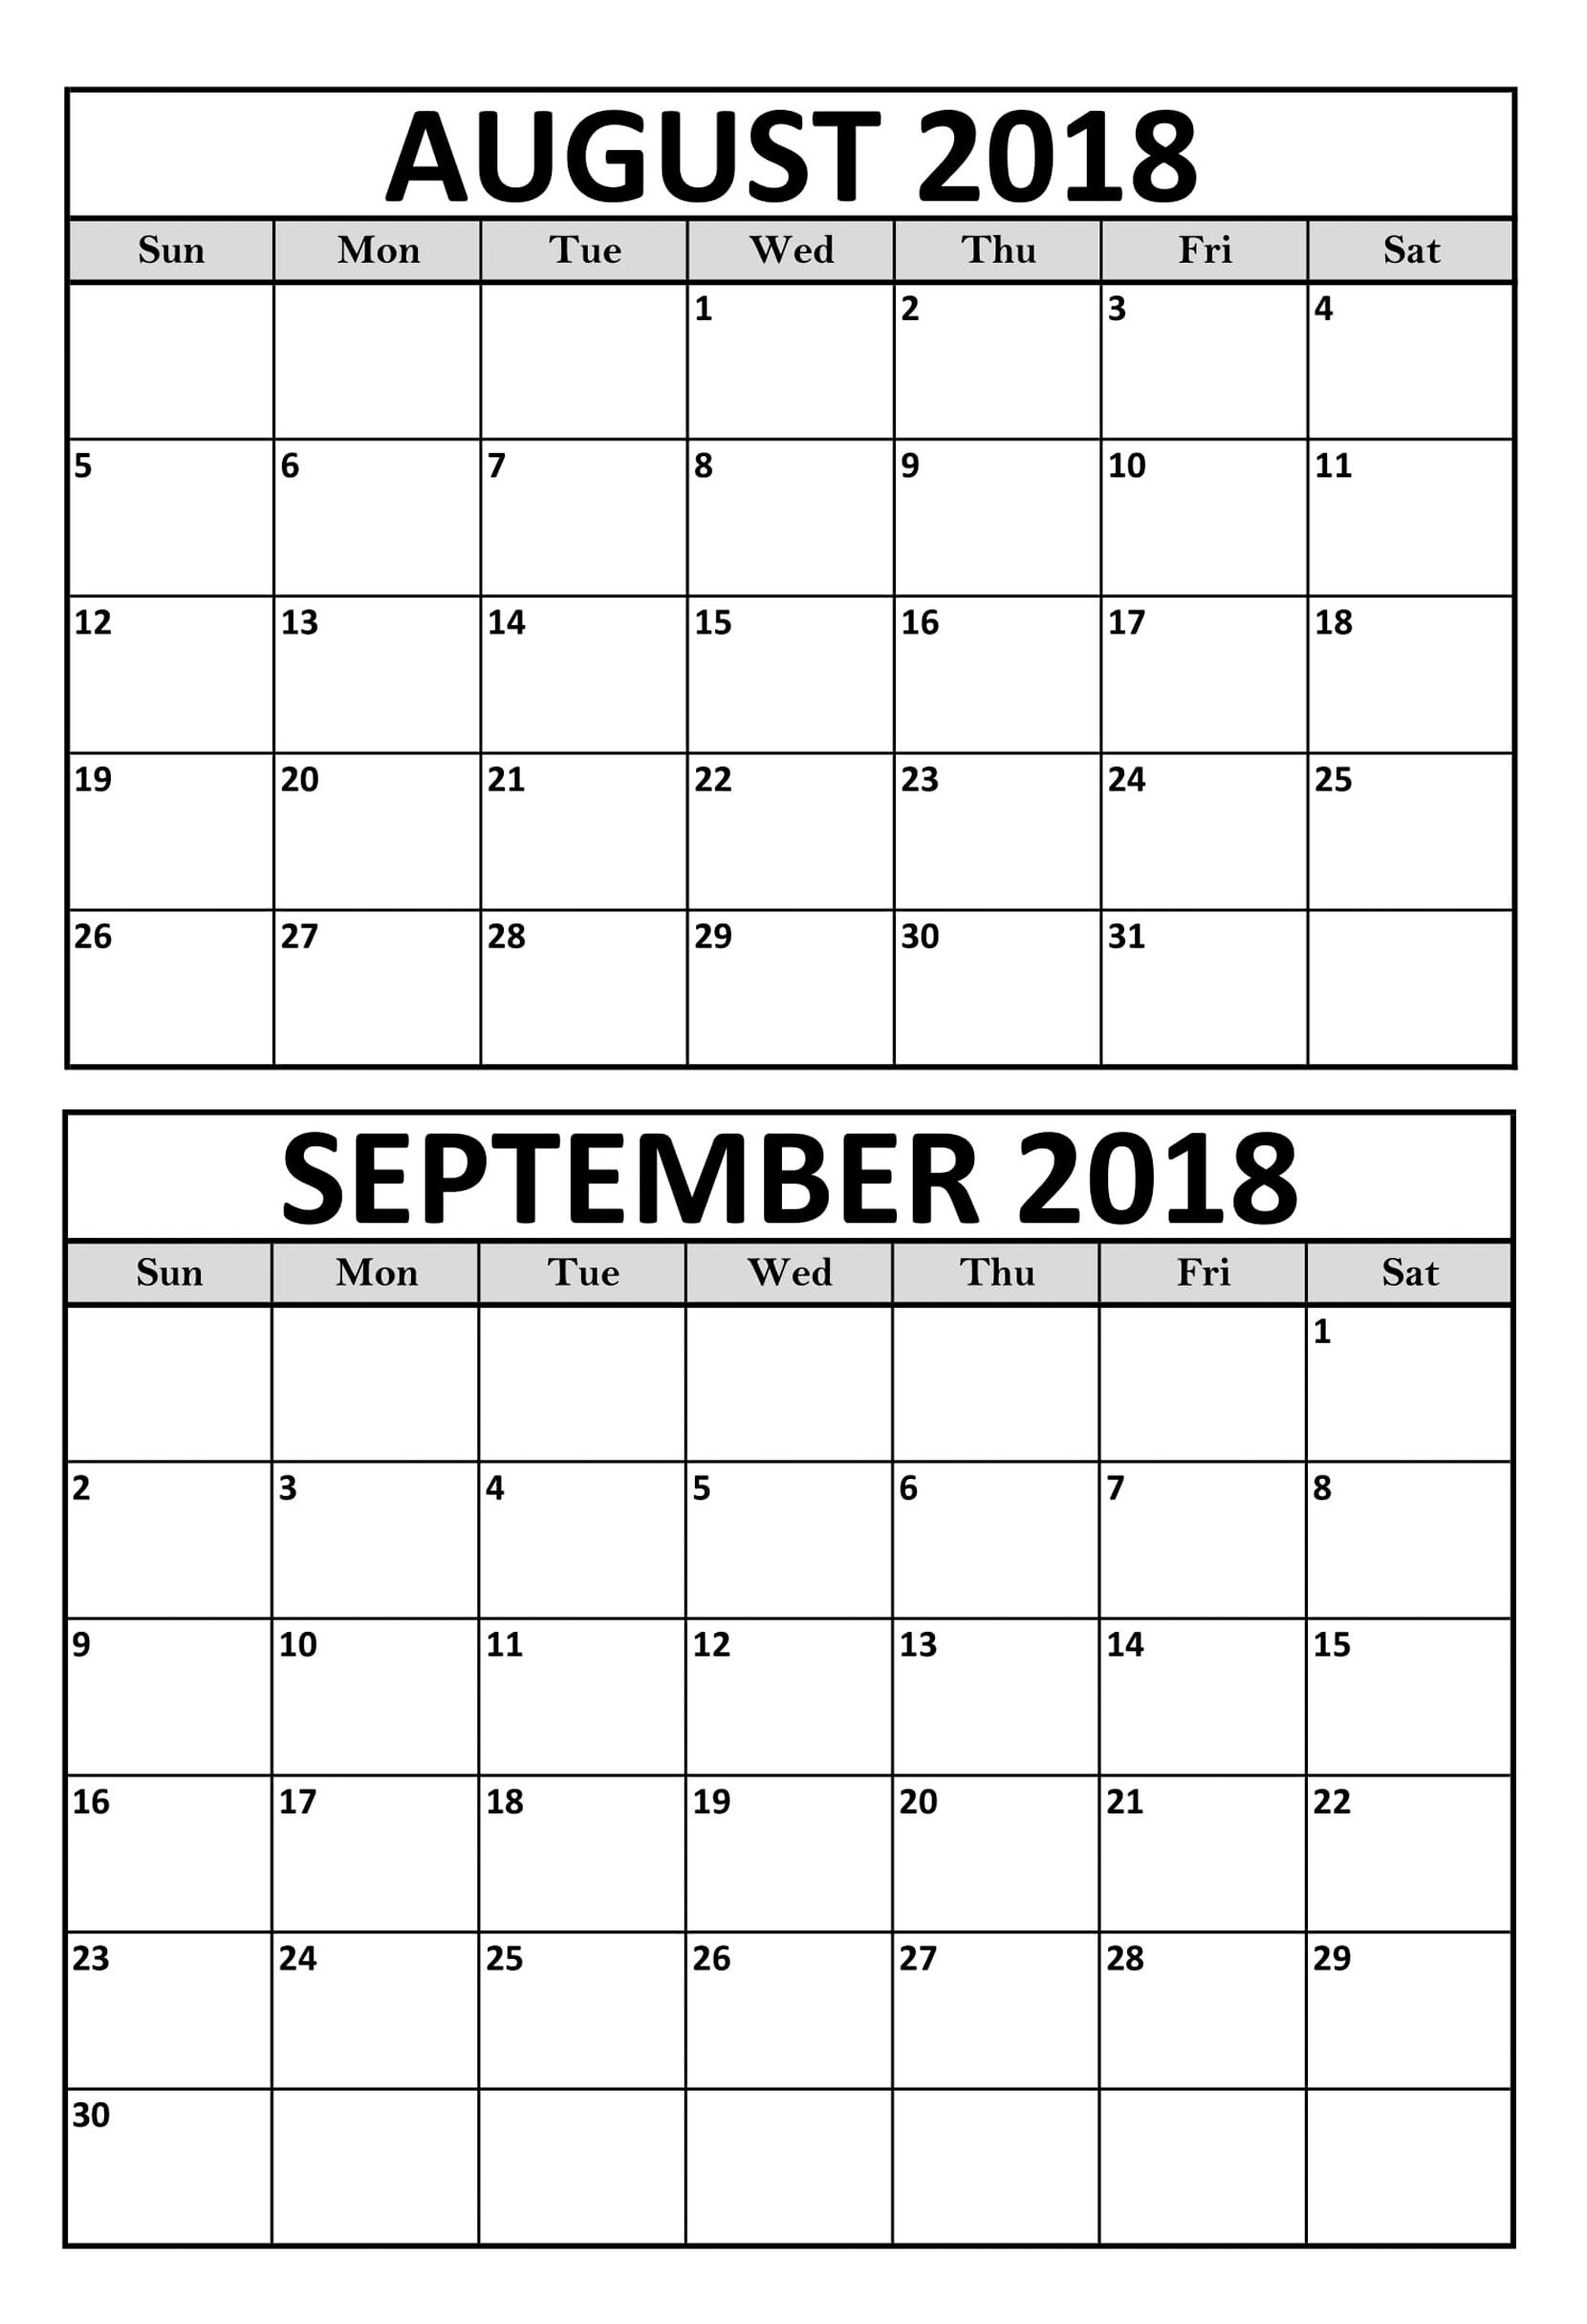 august september 2018 calendar printable template